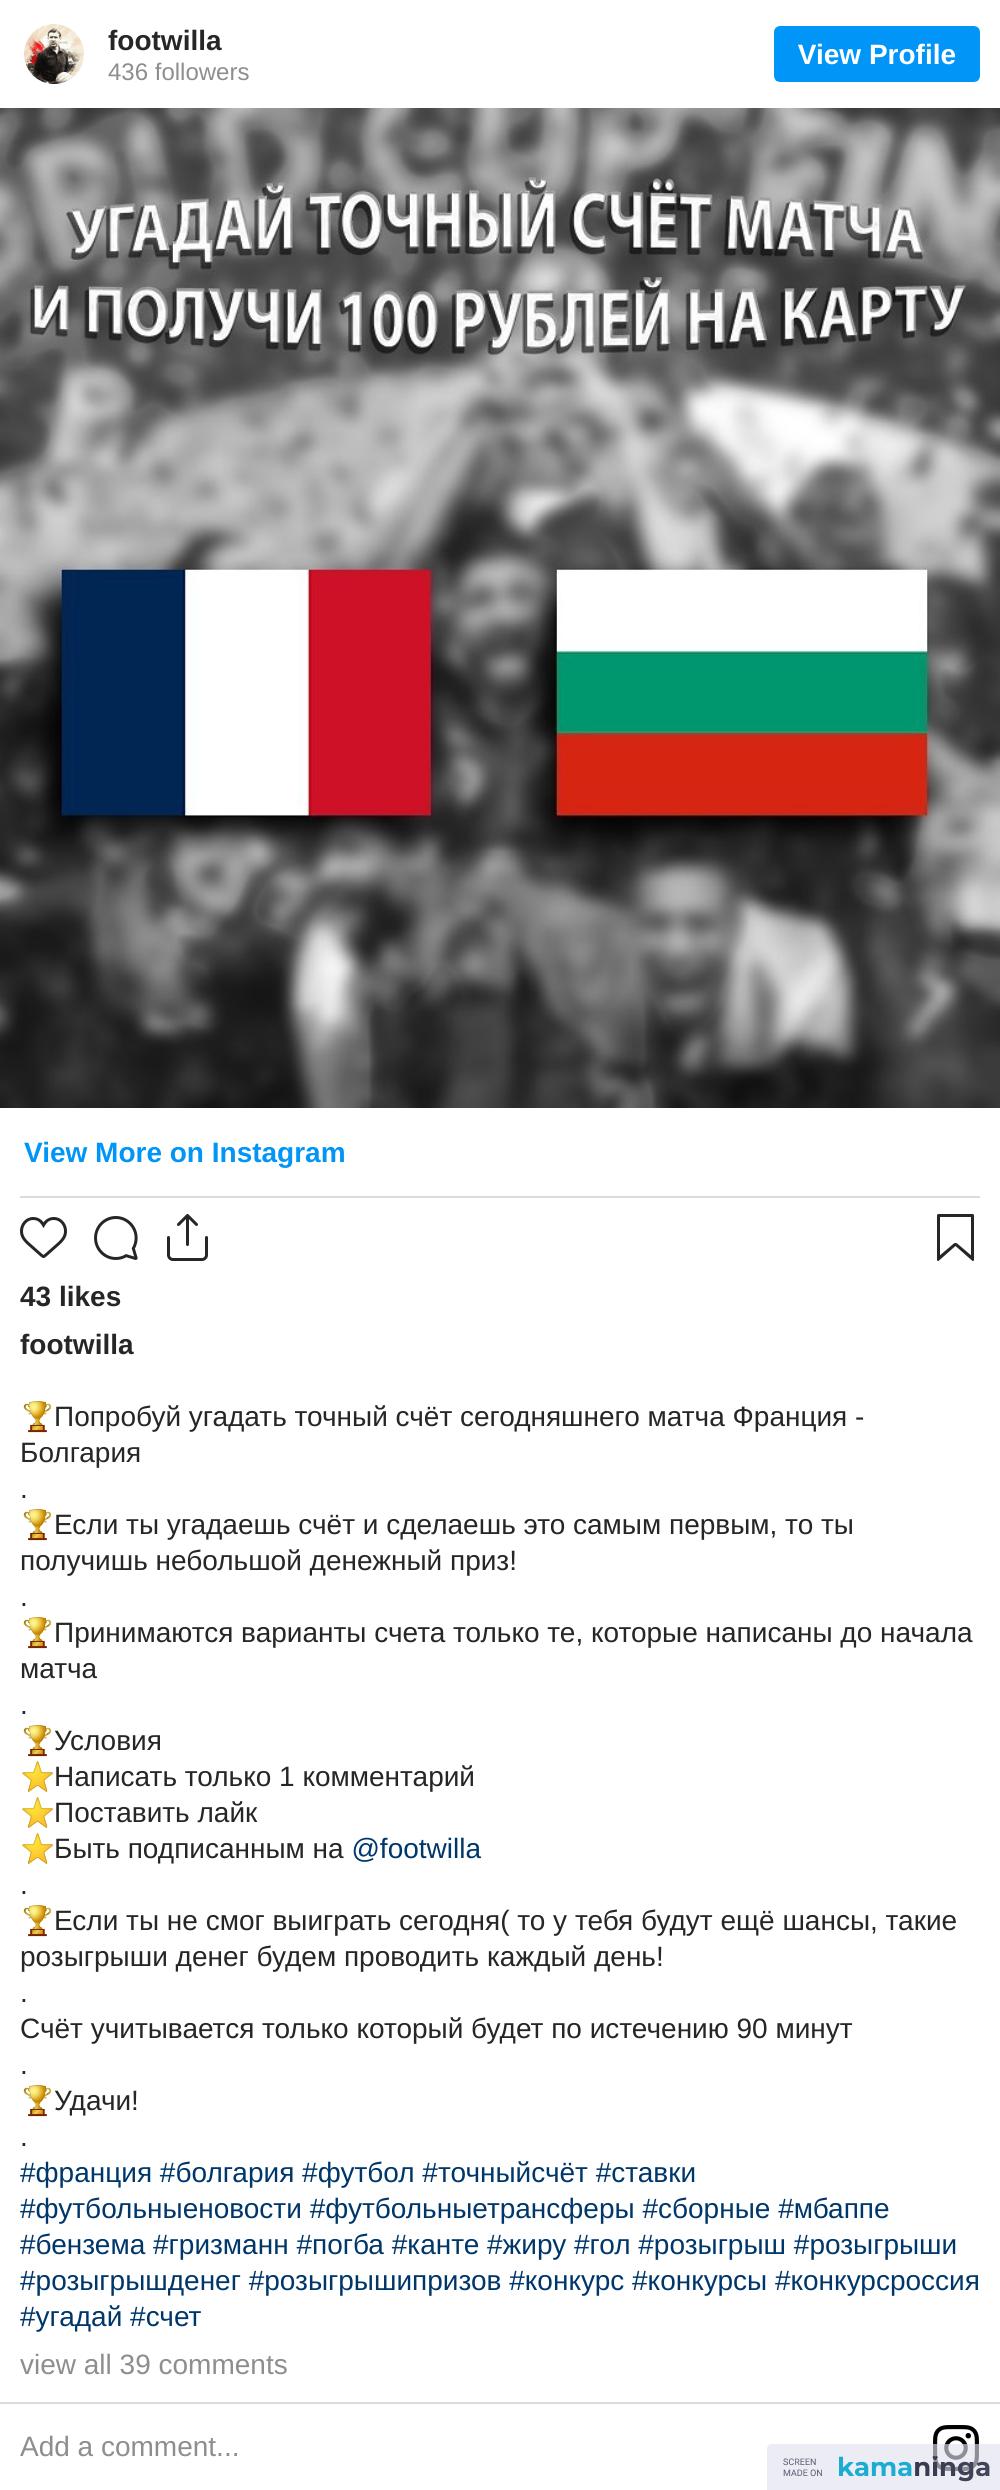 https://www.instagram.com/p/CP2-gr2gLNN/